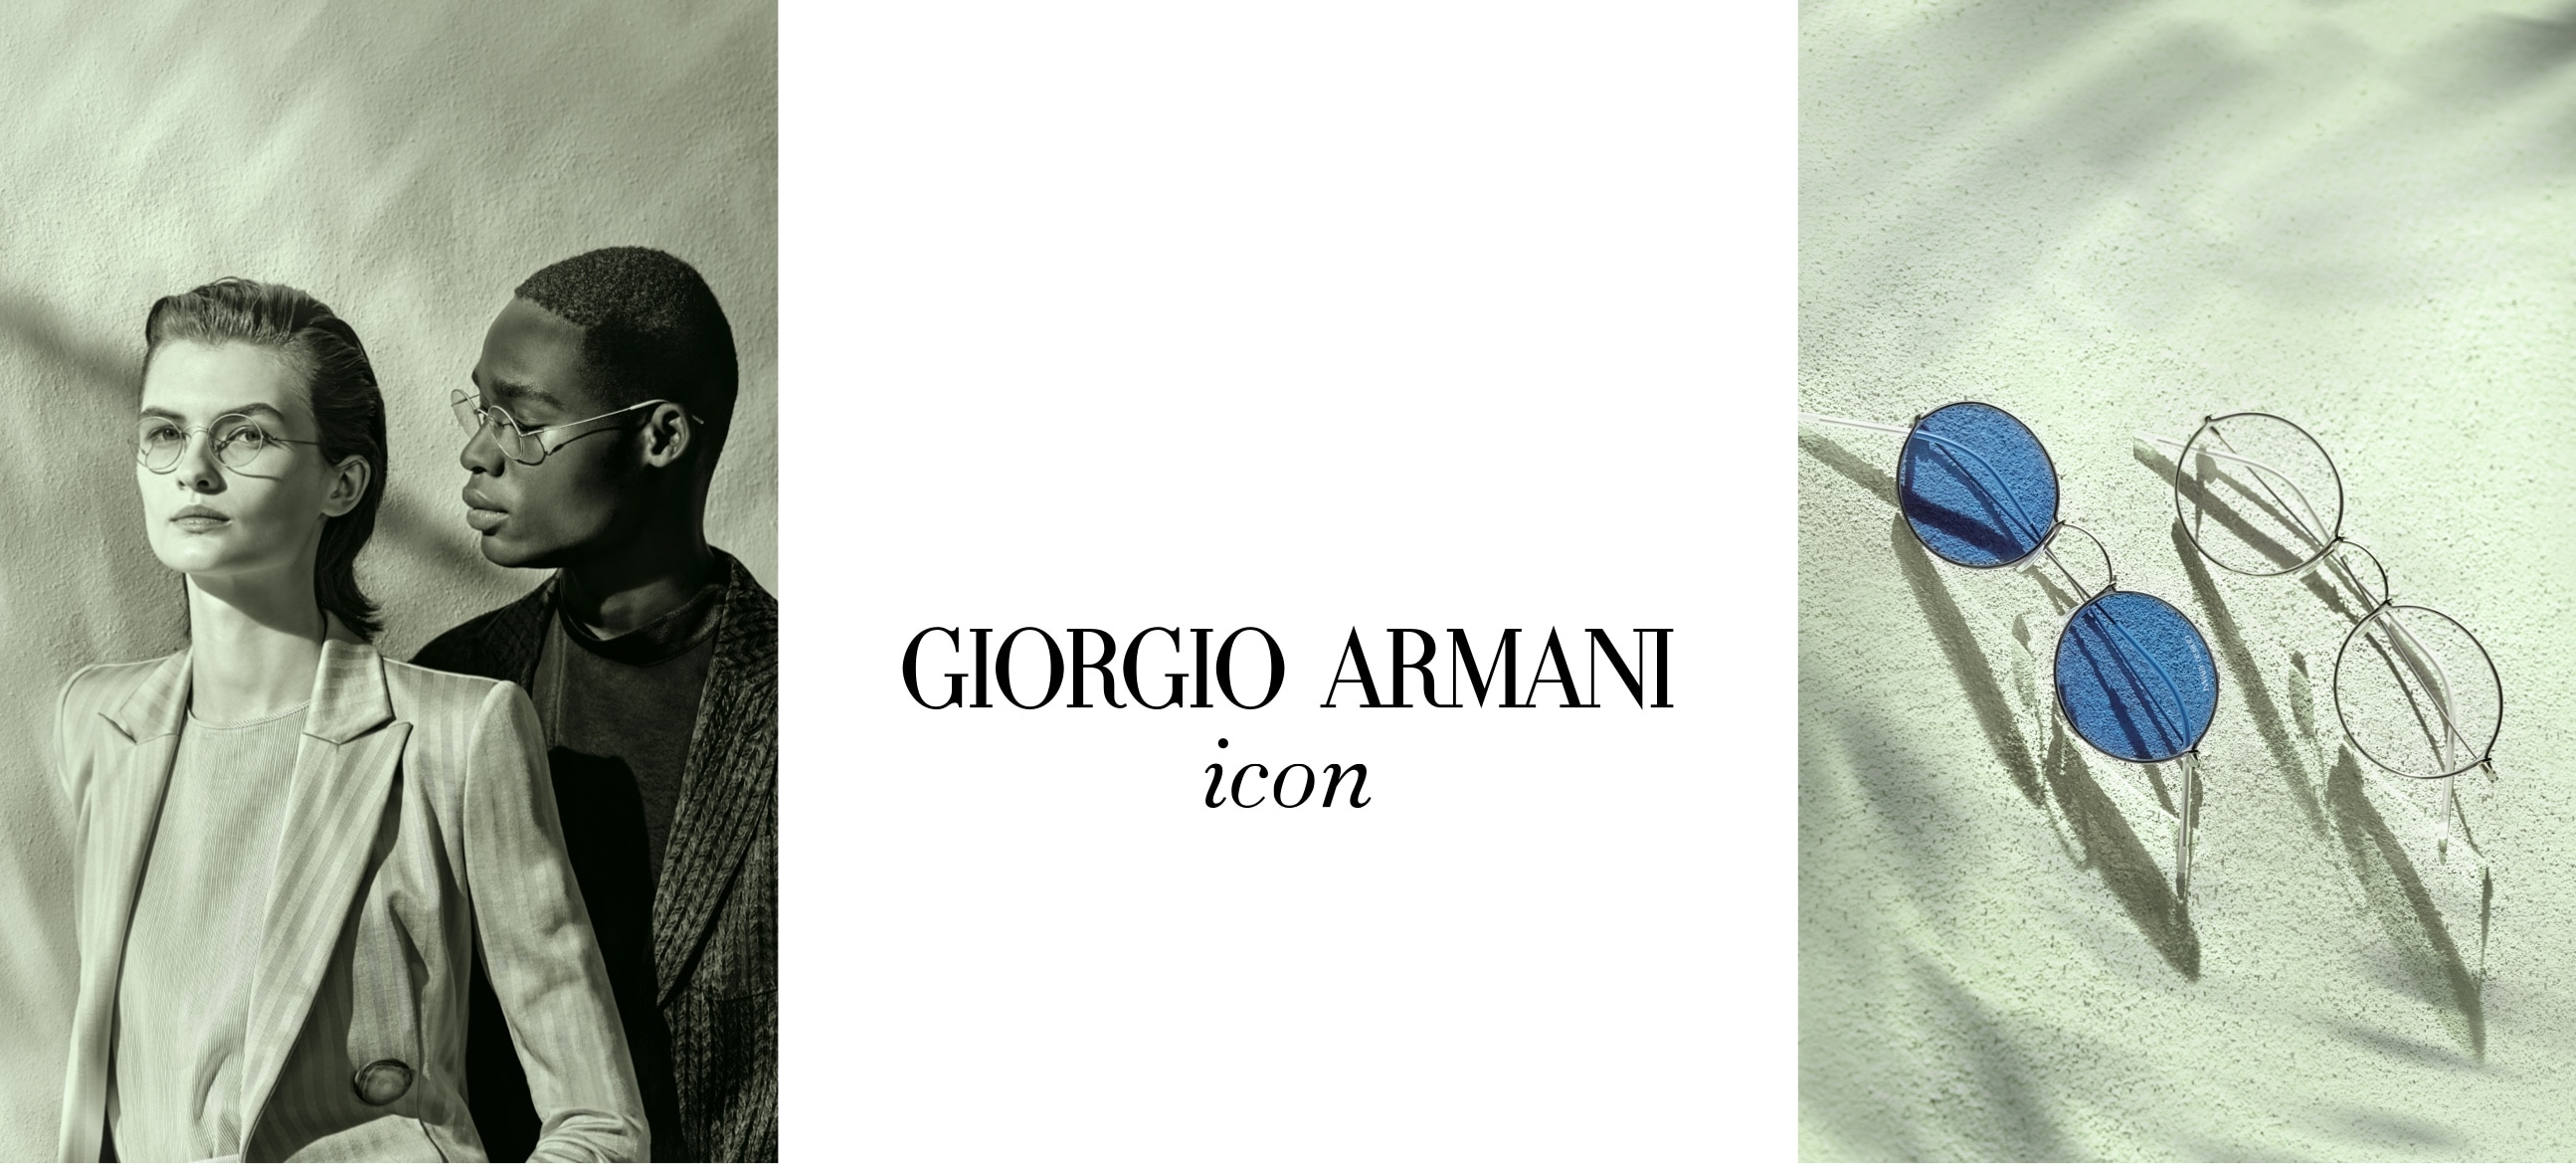 Armani hero banner